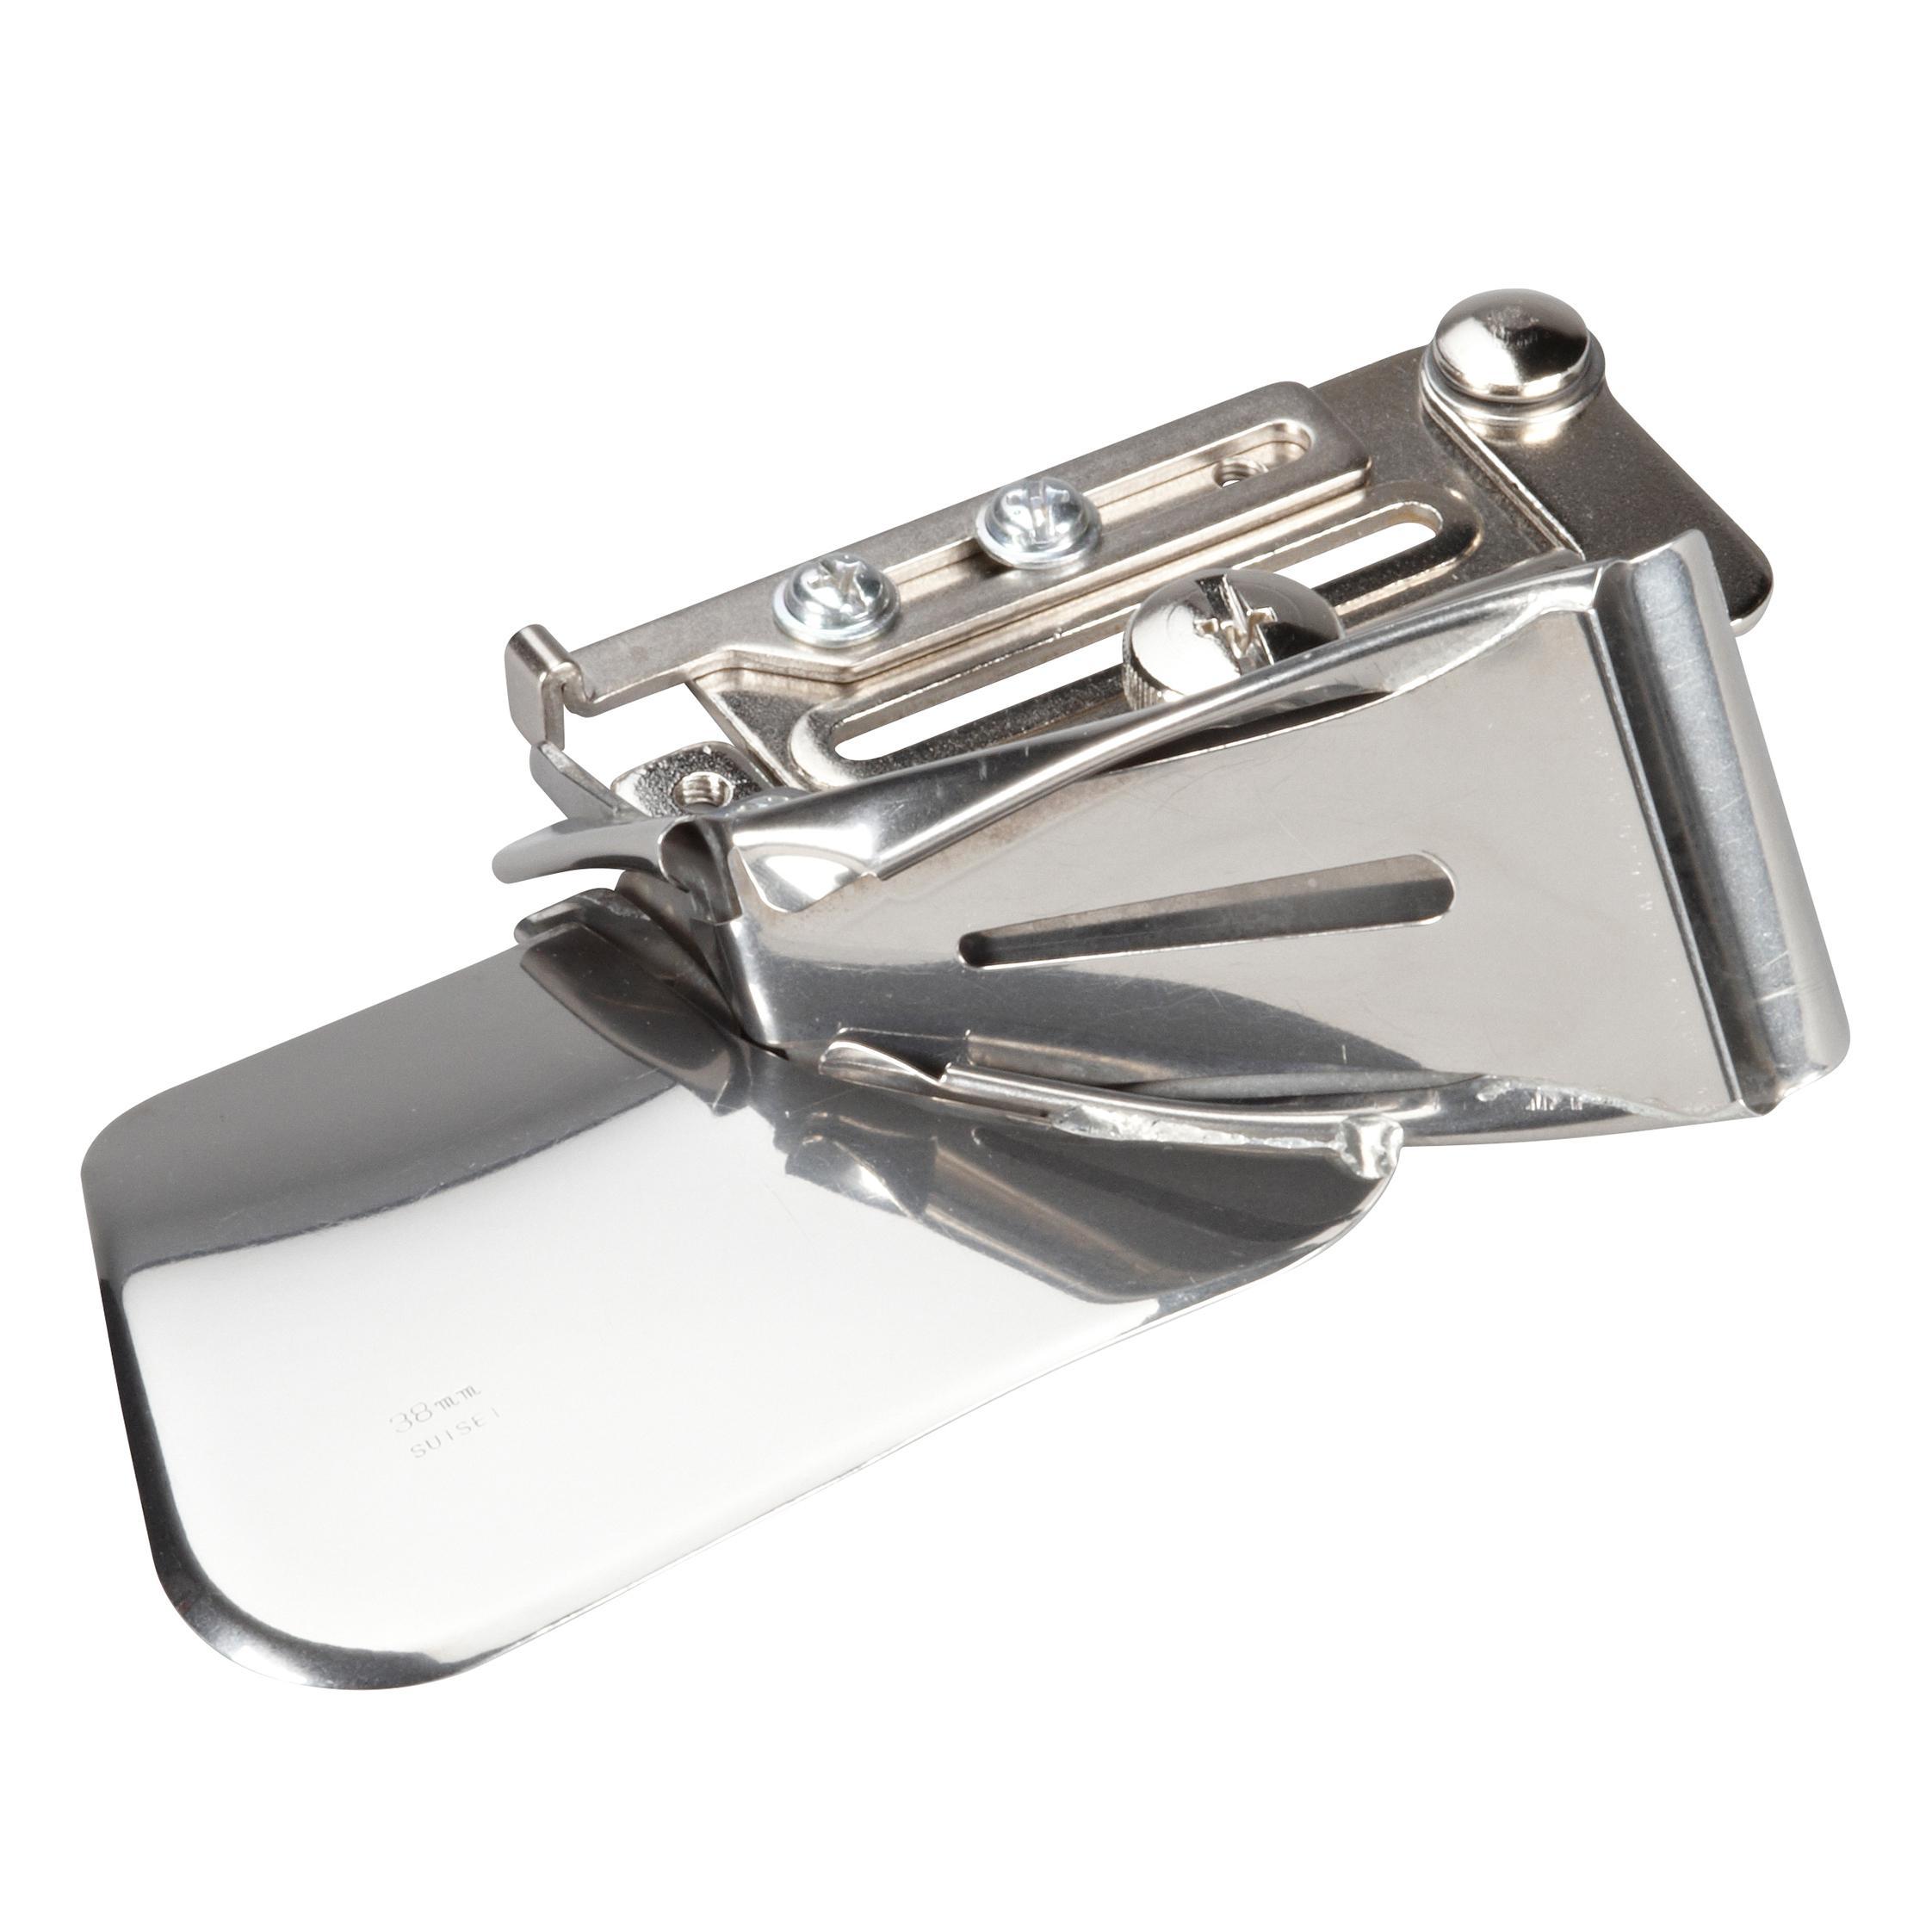 Bernina Binder Attachment # 88 For Unfolded Bias Tape